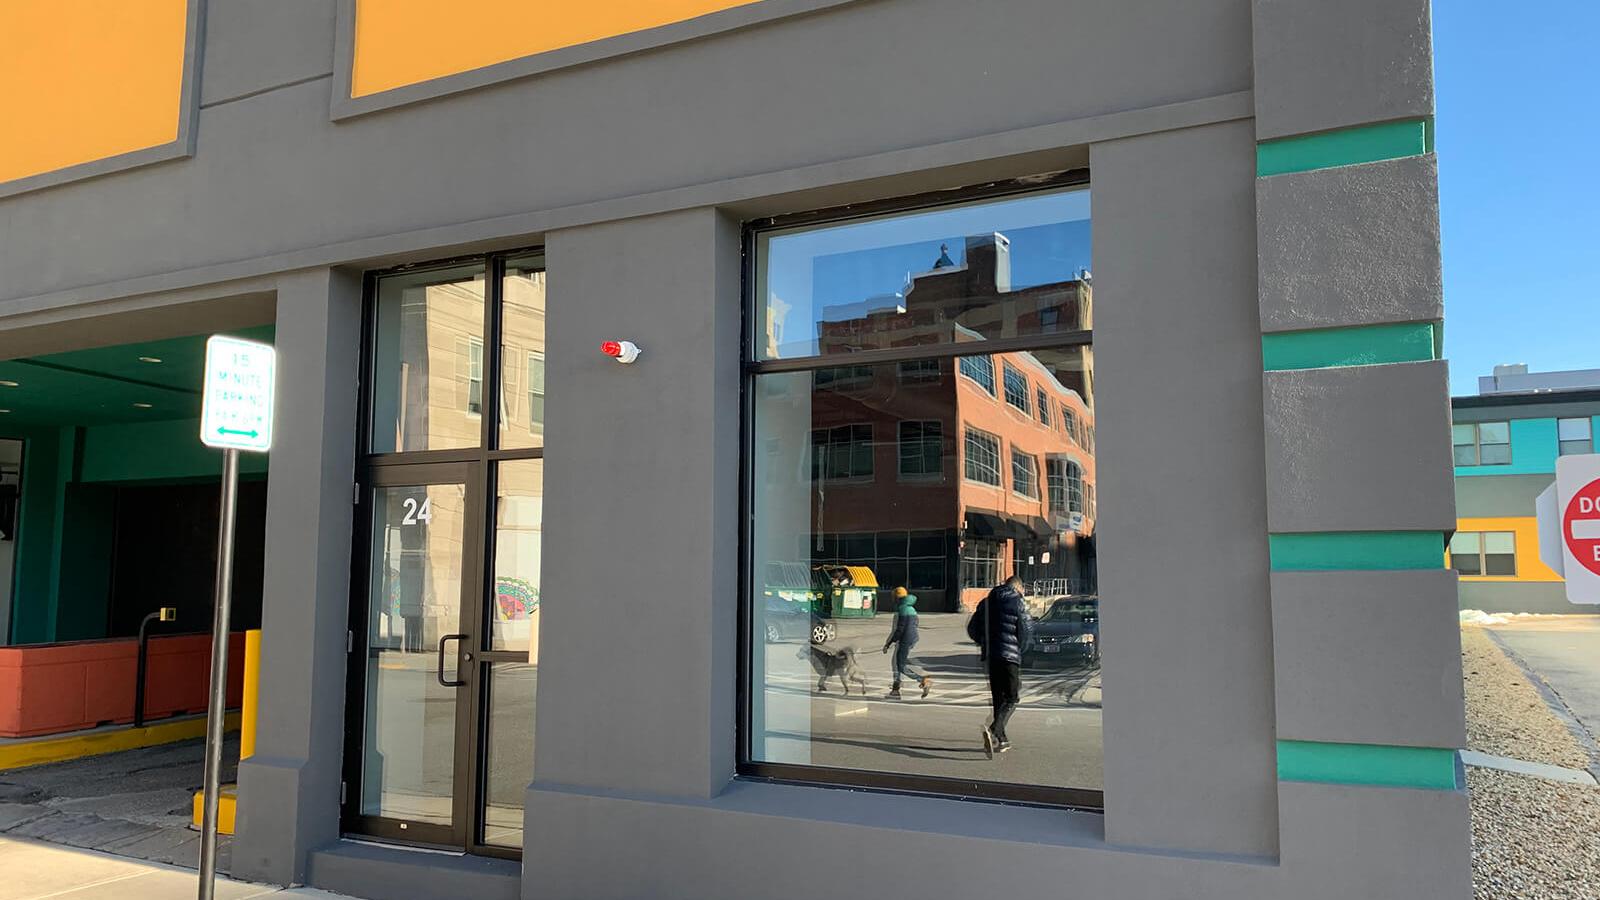 24 Portland Street, Worcester, Massachusetts 01608, Retail / Restaurant,For Lease,Portland Street,1315